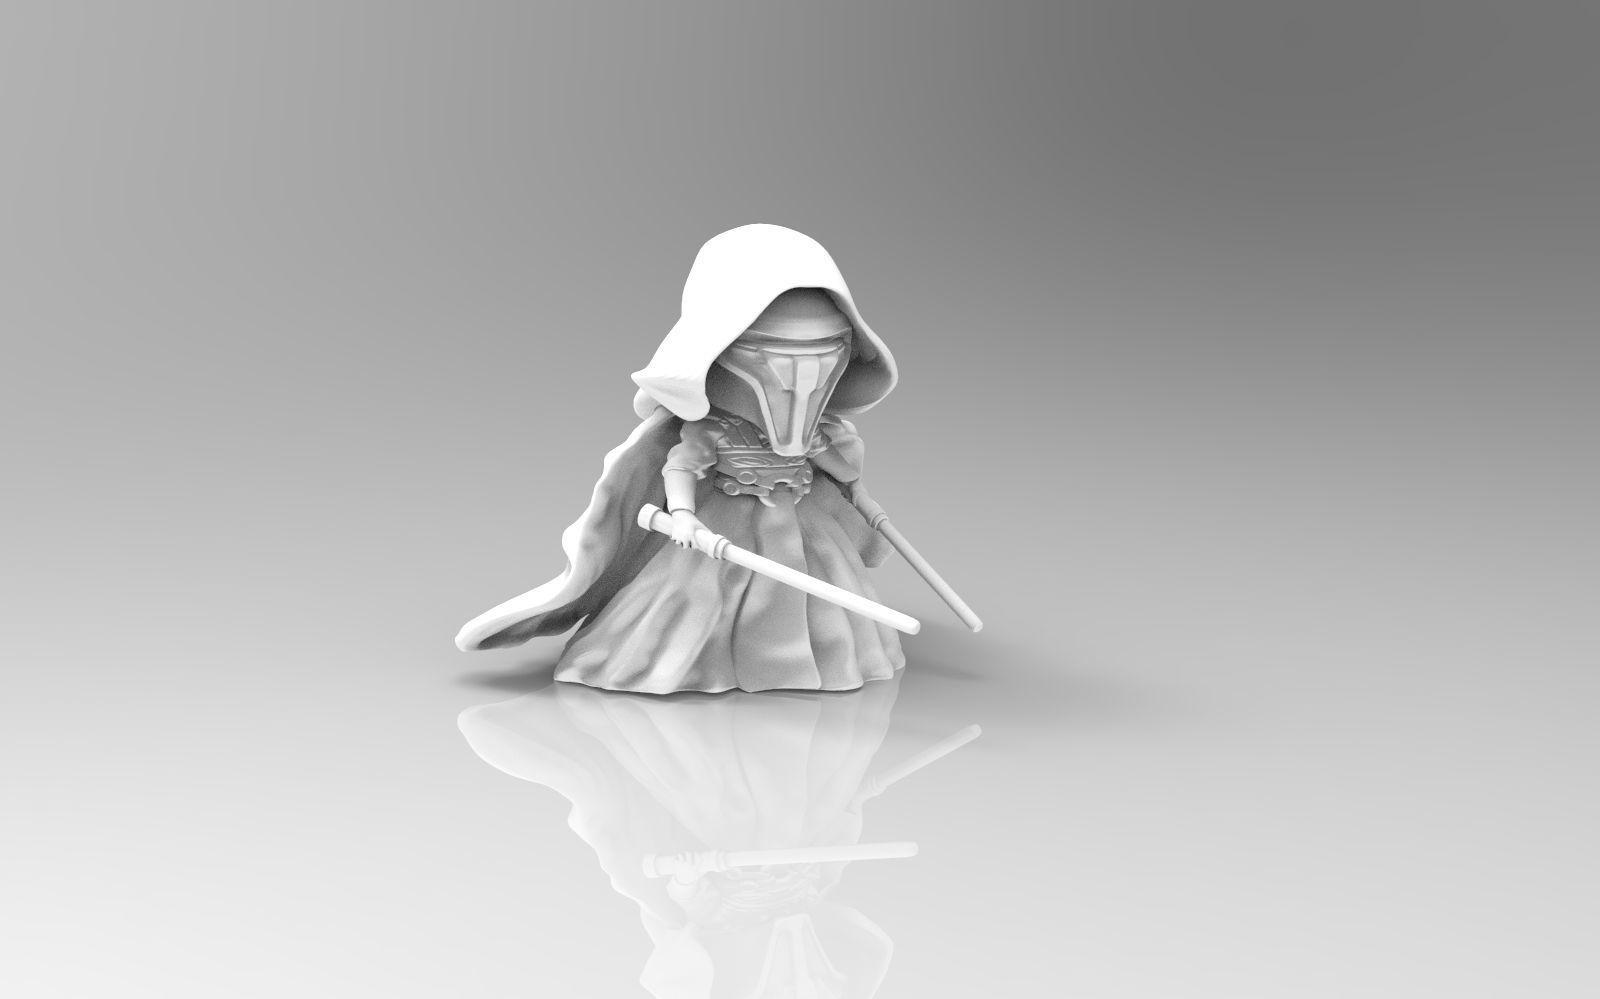 Chibi Ancient Knight